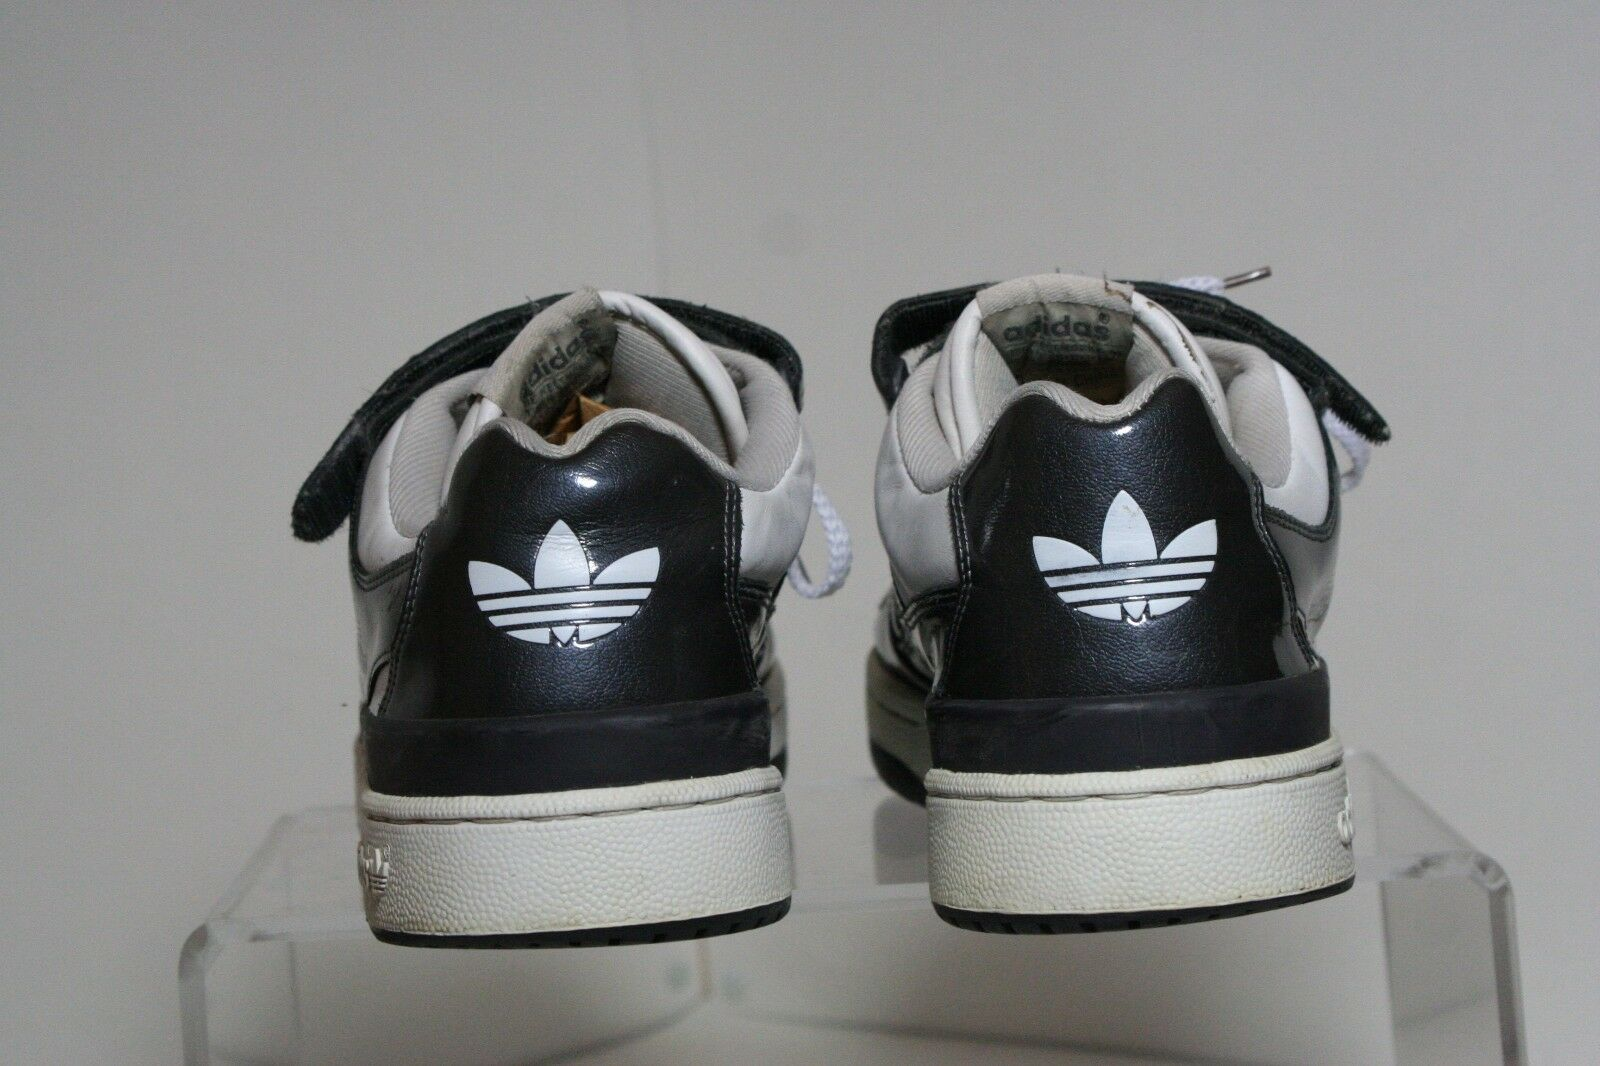 Adidas forum niedrigen og 02